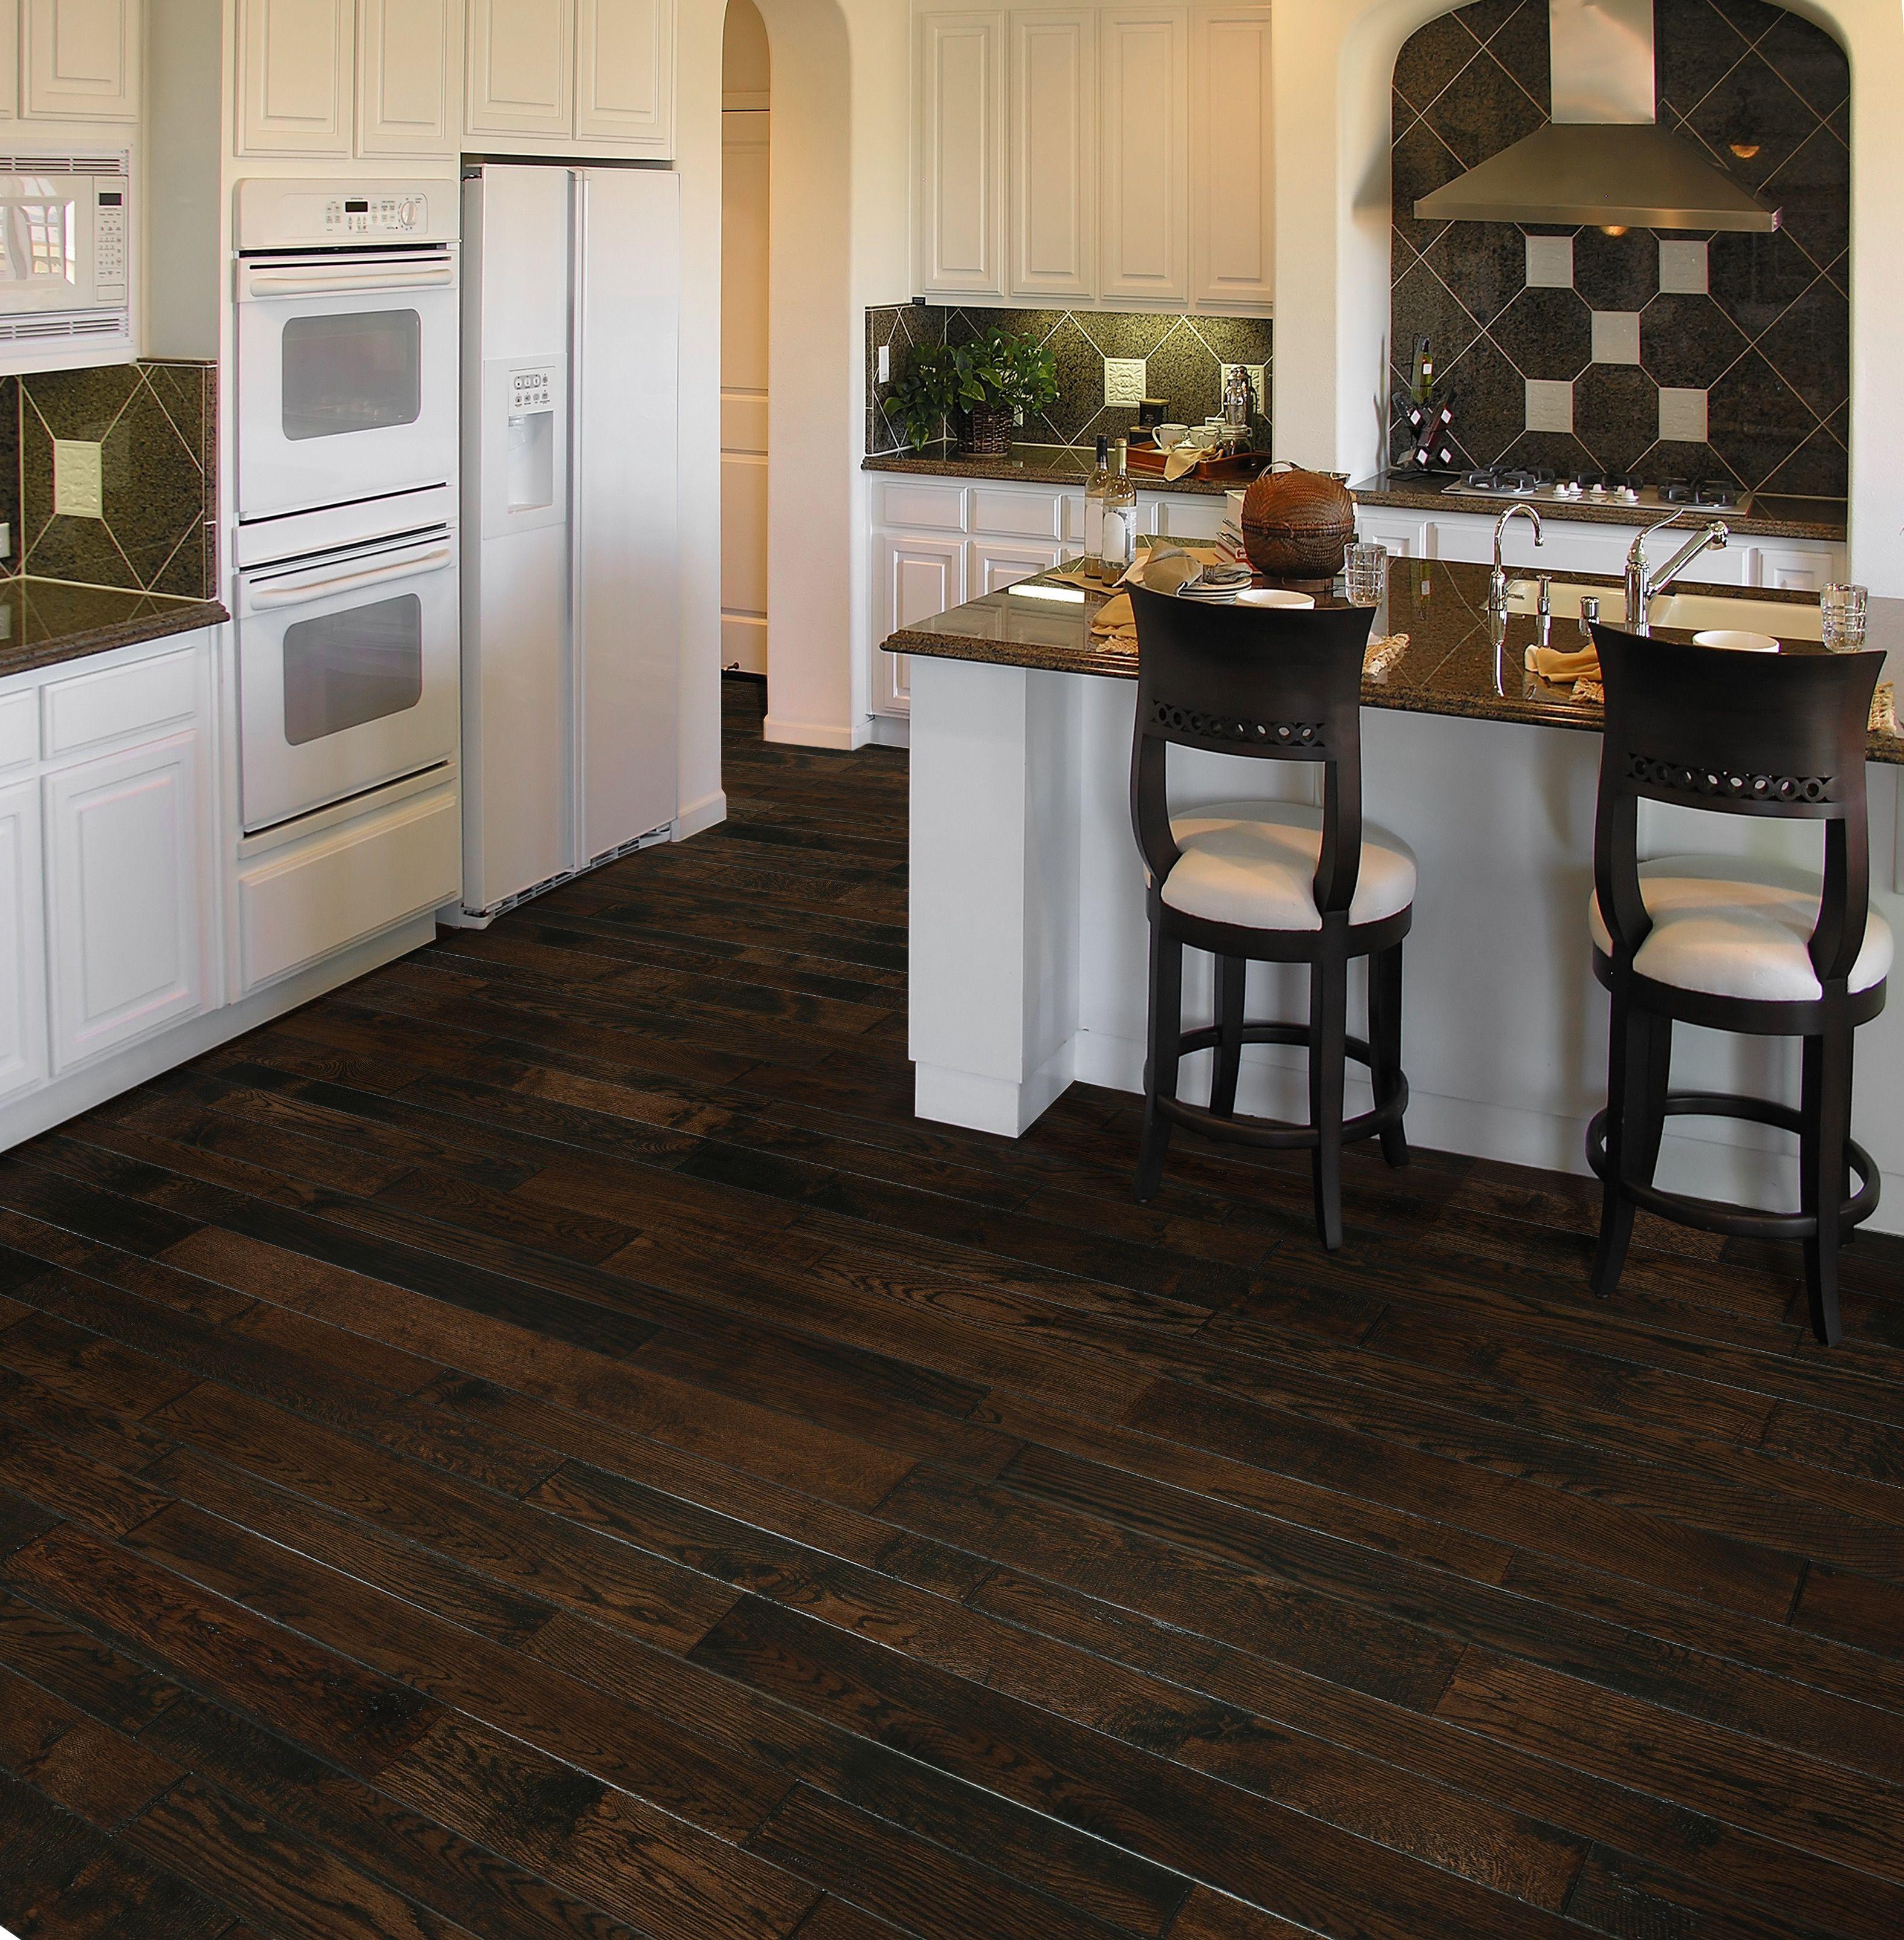 installing unfinished hardwood floors of hardwood floor installation floor plan ideas inside new hardwood floor installation in kansas city by svb wood floors we install new wood floors